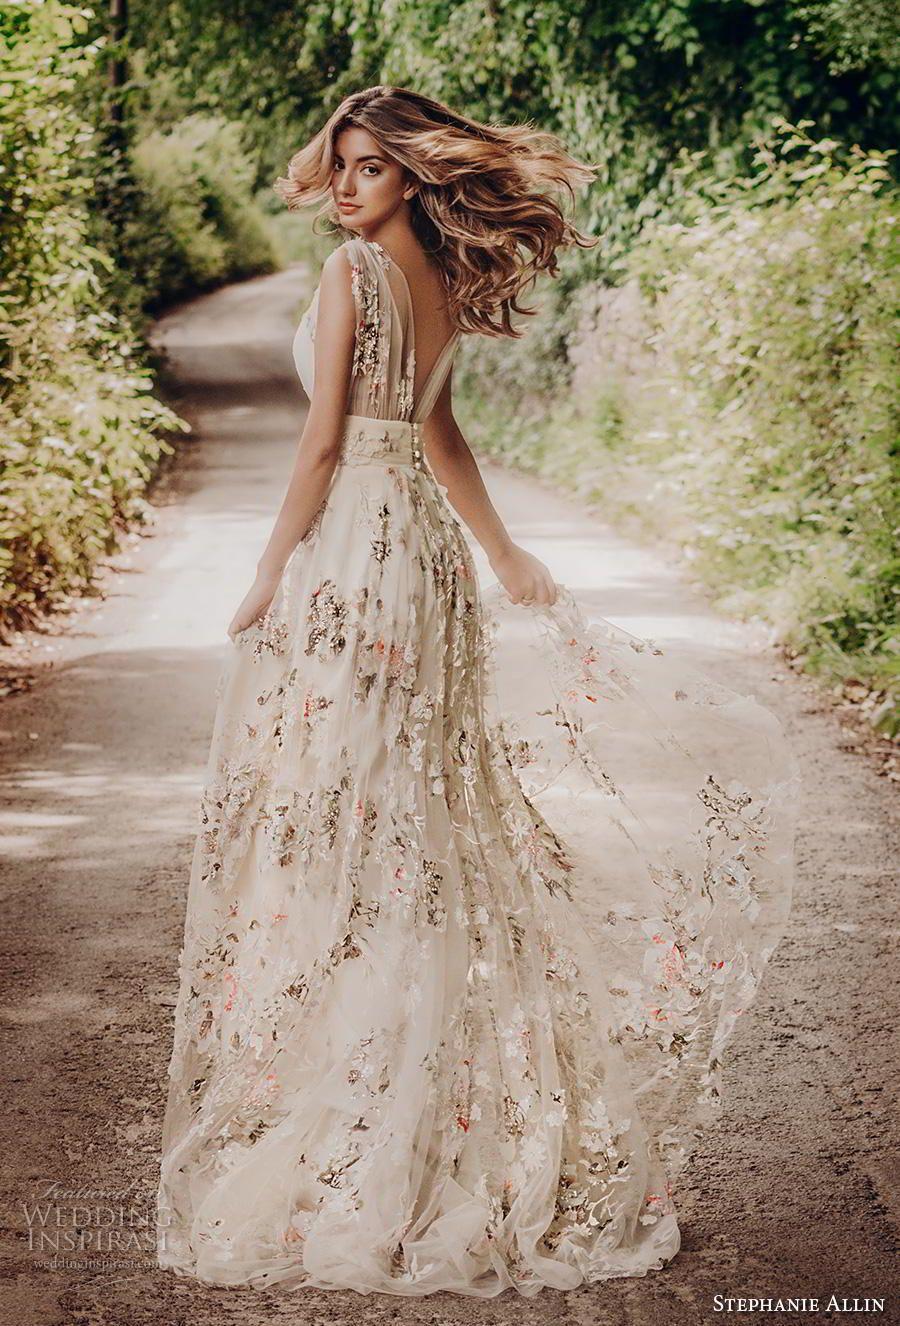 Stephanie Allin 2019 Wedding Dresses Love Stories Bridal Collection Wedding Inspirasi Floral Wedding Dress A Line Wedding Dress Casual Wedding Dress [ 1326 x 900 Pixel ]